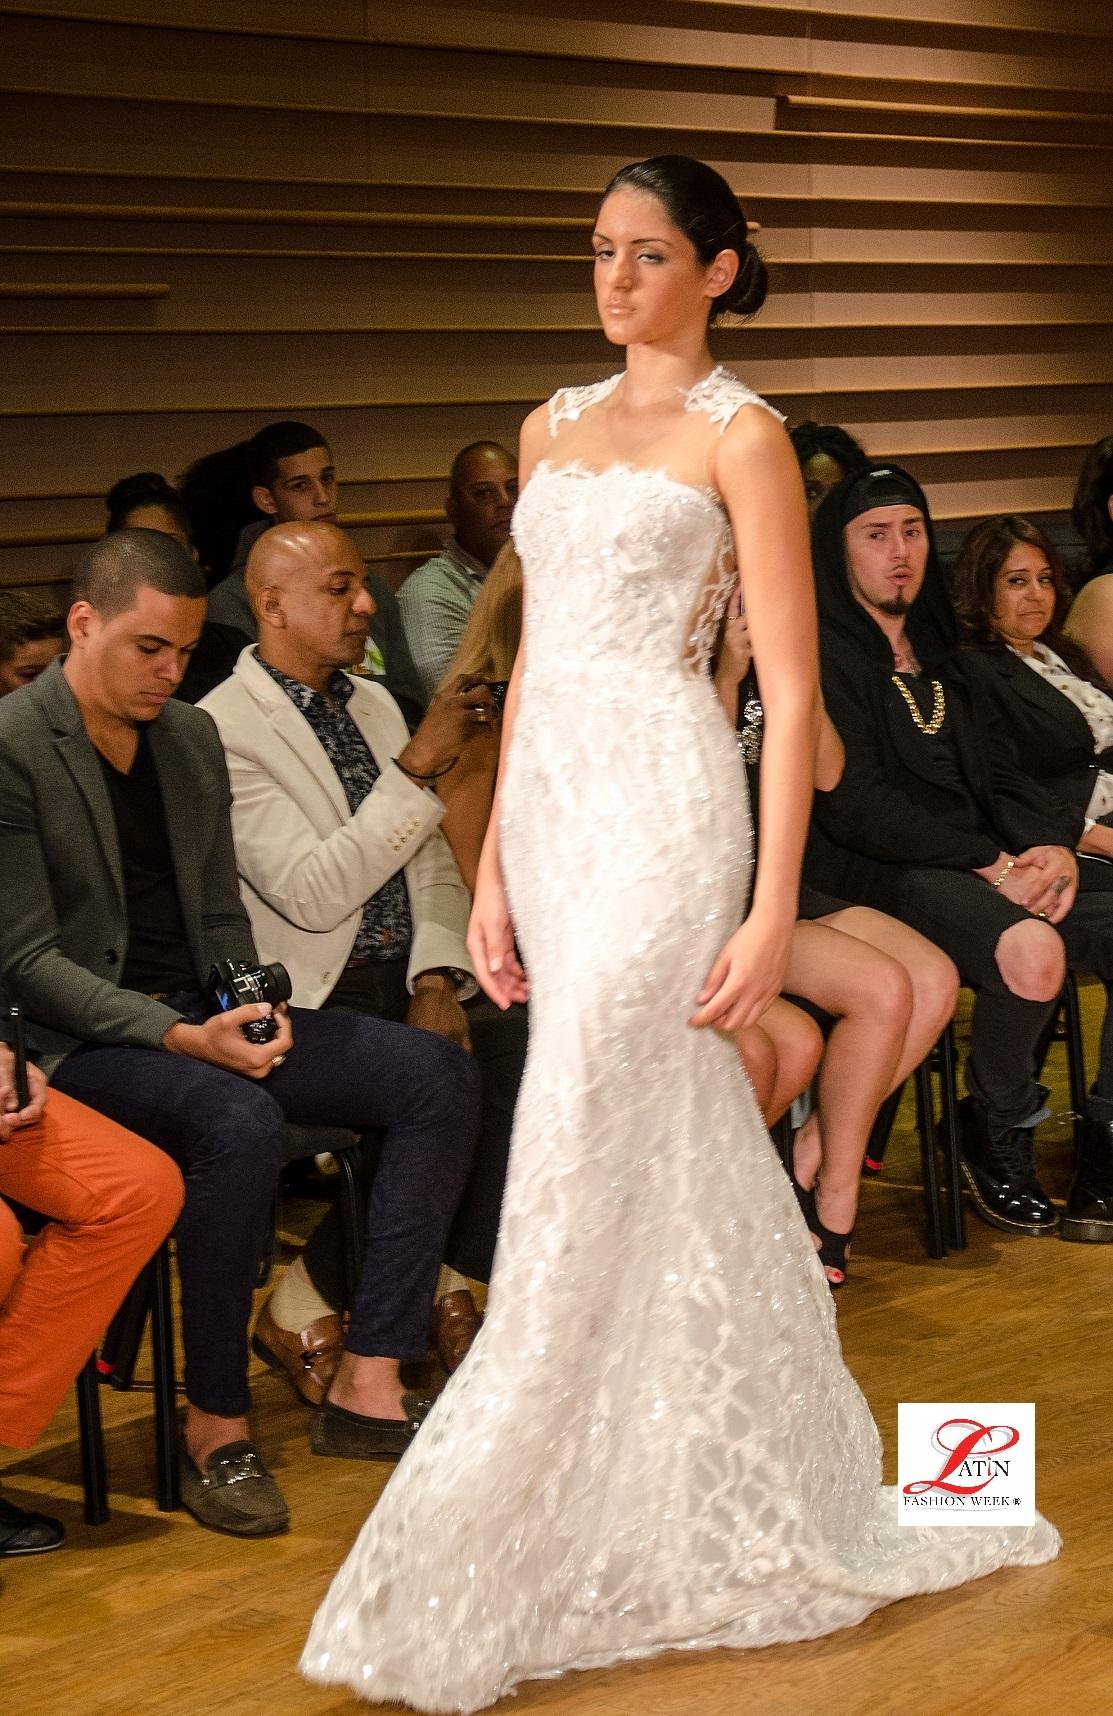 _DSC2986_Sonia  Santiago NYFW Latin Fashion Week NY LNYFW  (1) 2.jpg